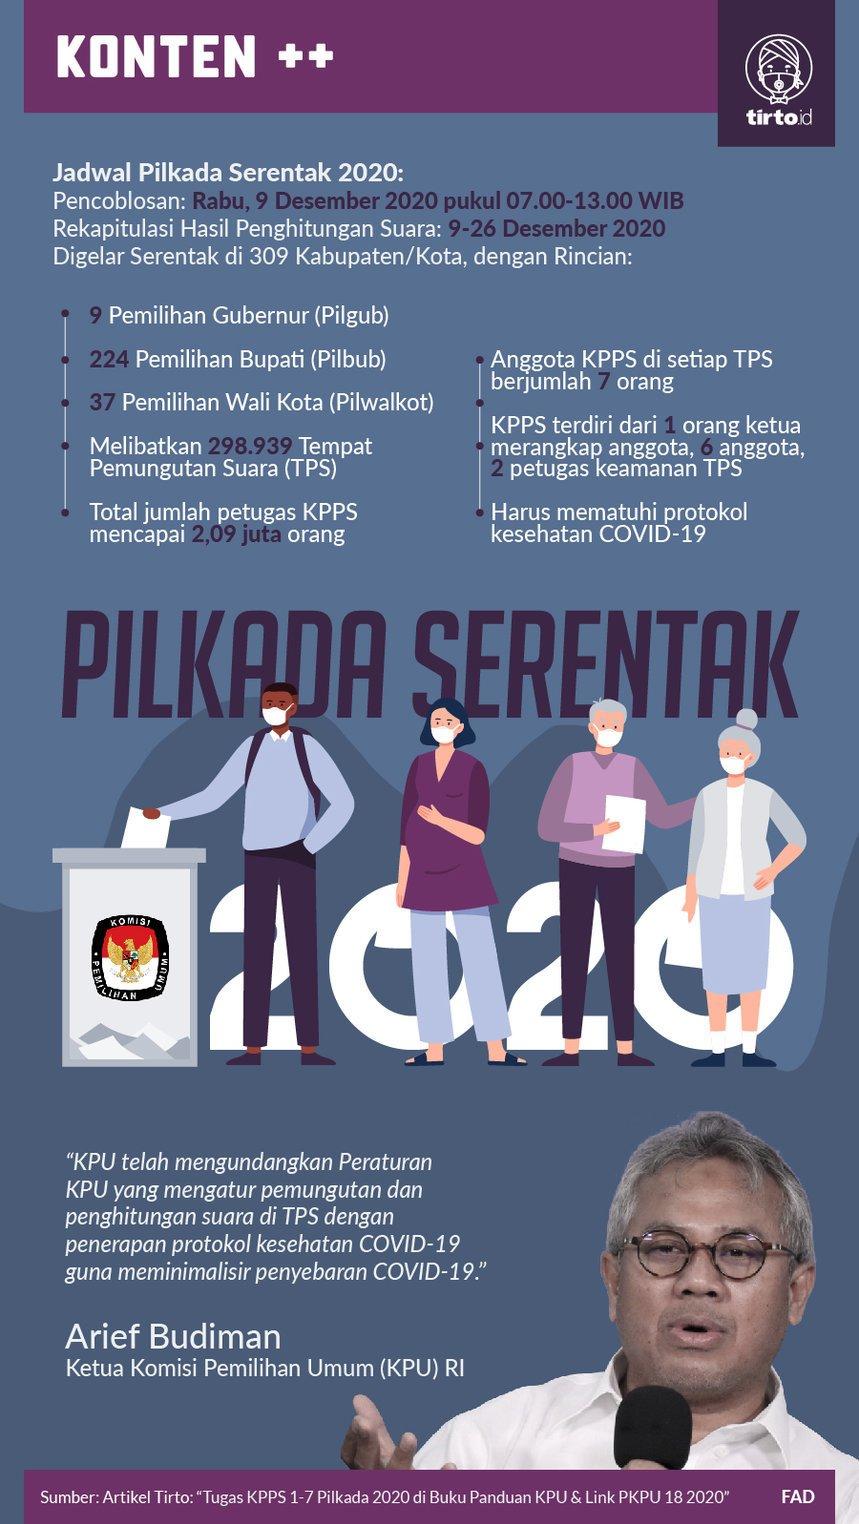 Buku Panduan Kpps 2019 Pdf : panduan, Tugas, Pilkada, Panduan, Tirto.ID